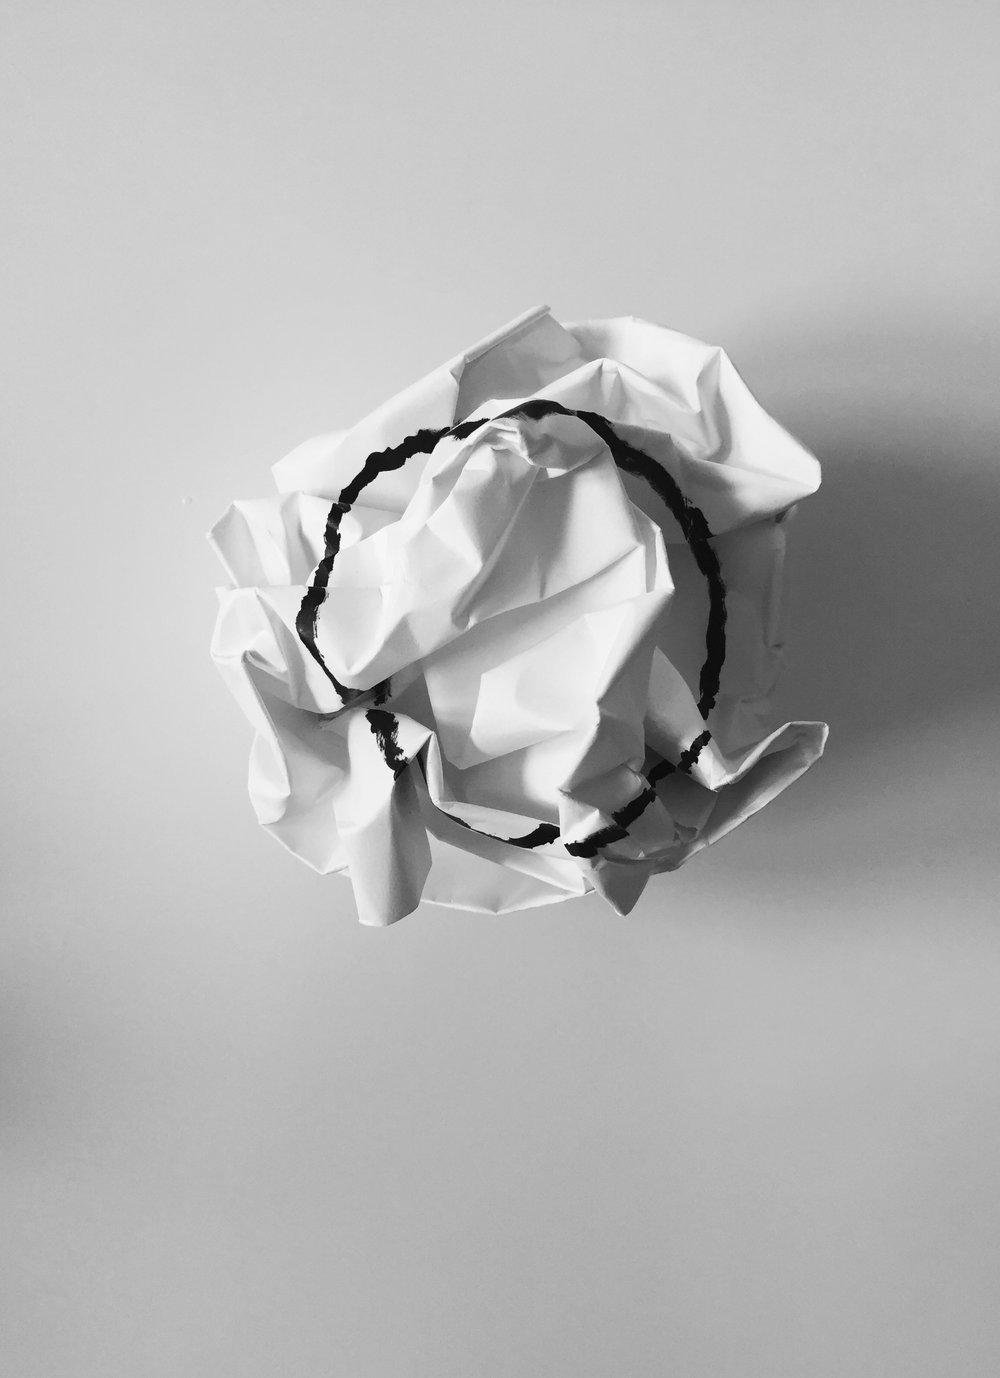 Ian Valor  - Exploding Circle (Paper Ball)